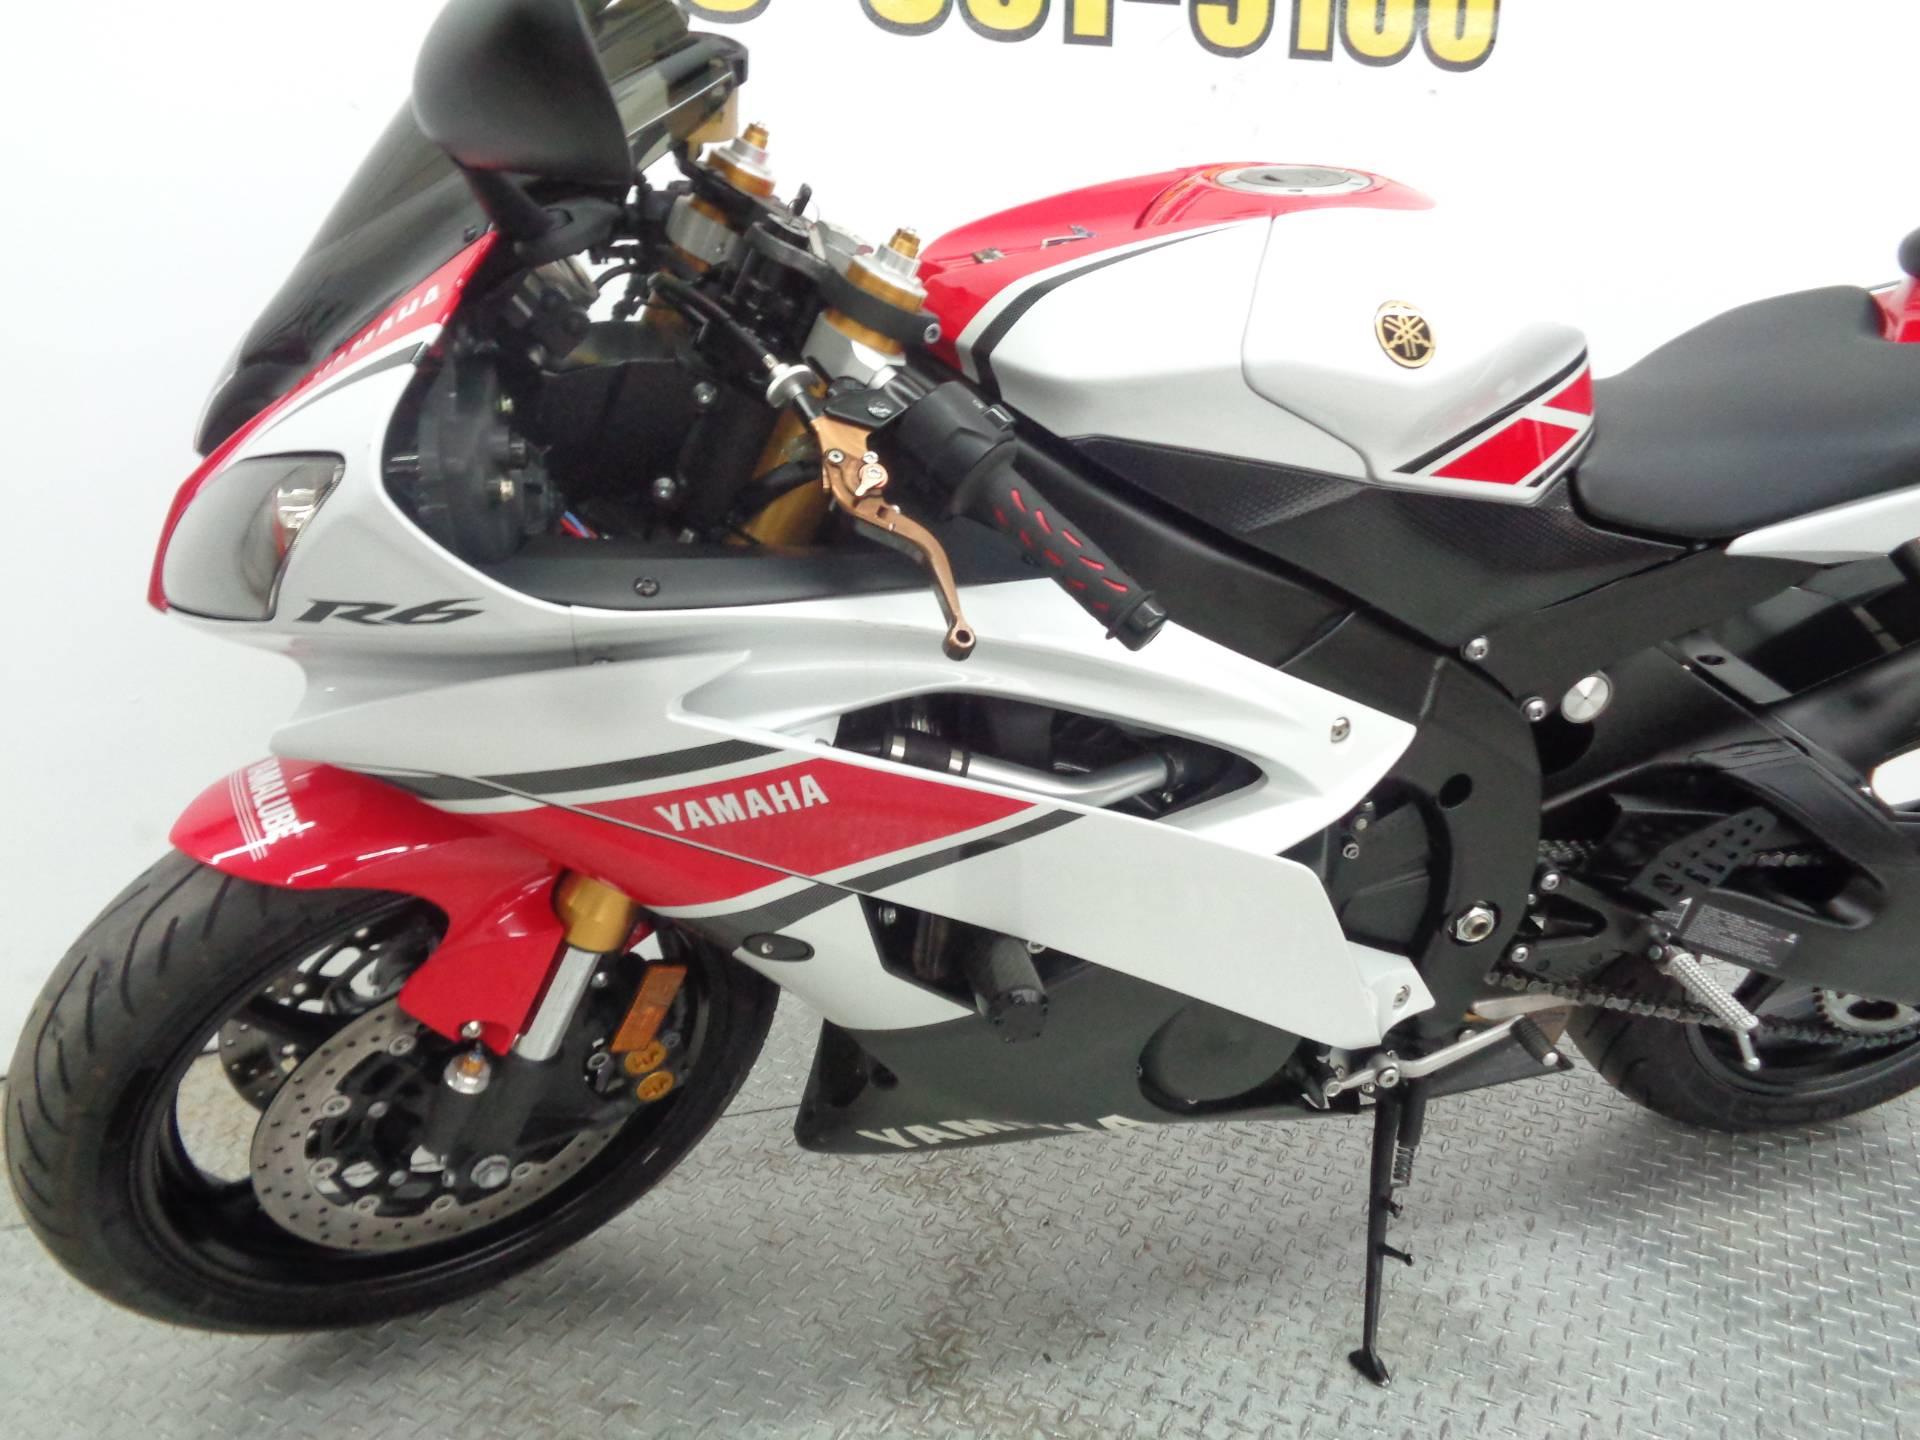 2012 Yamaha YZF-R6 World GP 50th Anniversary Edition 6